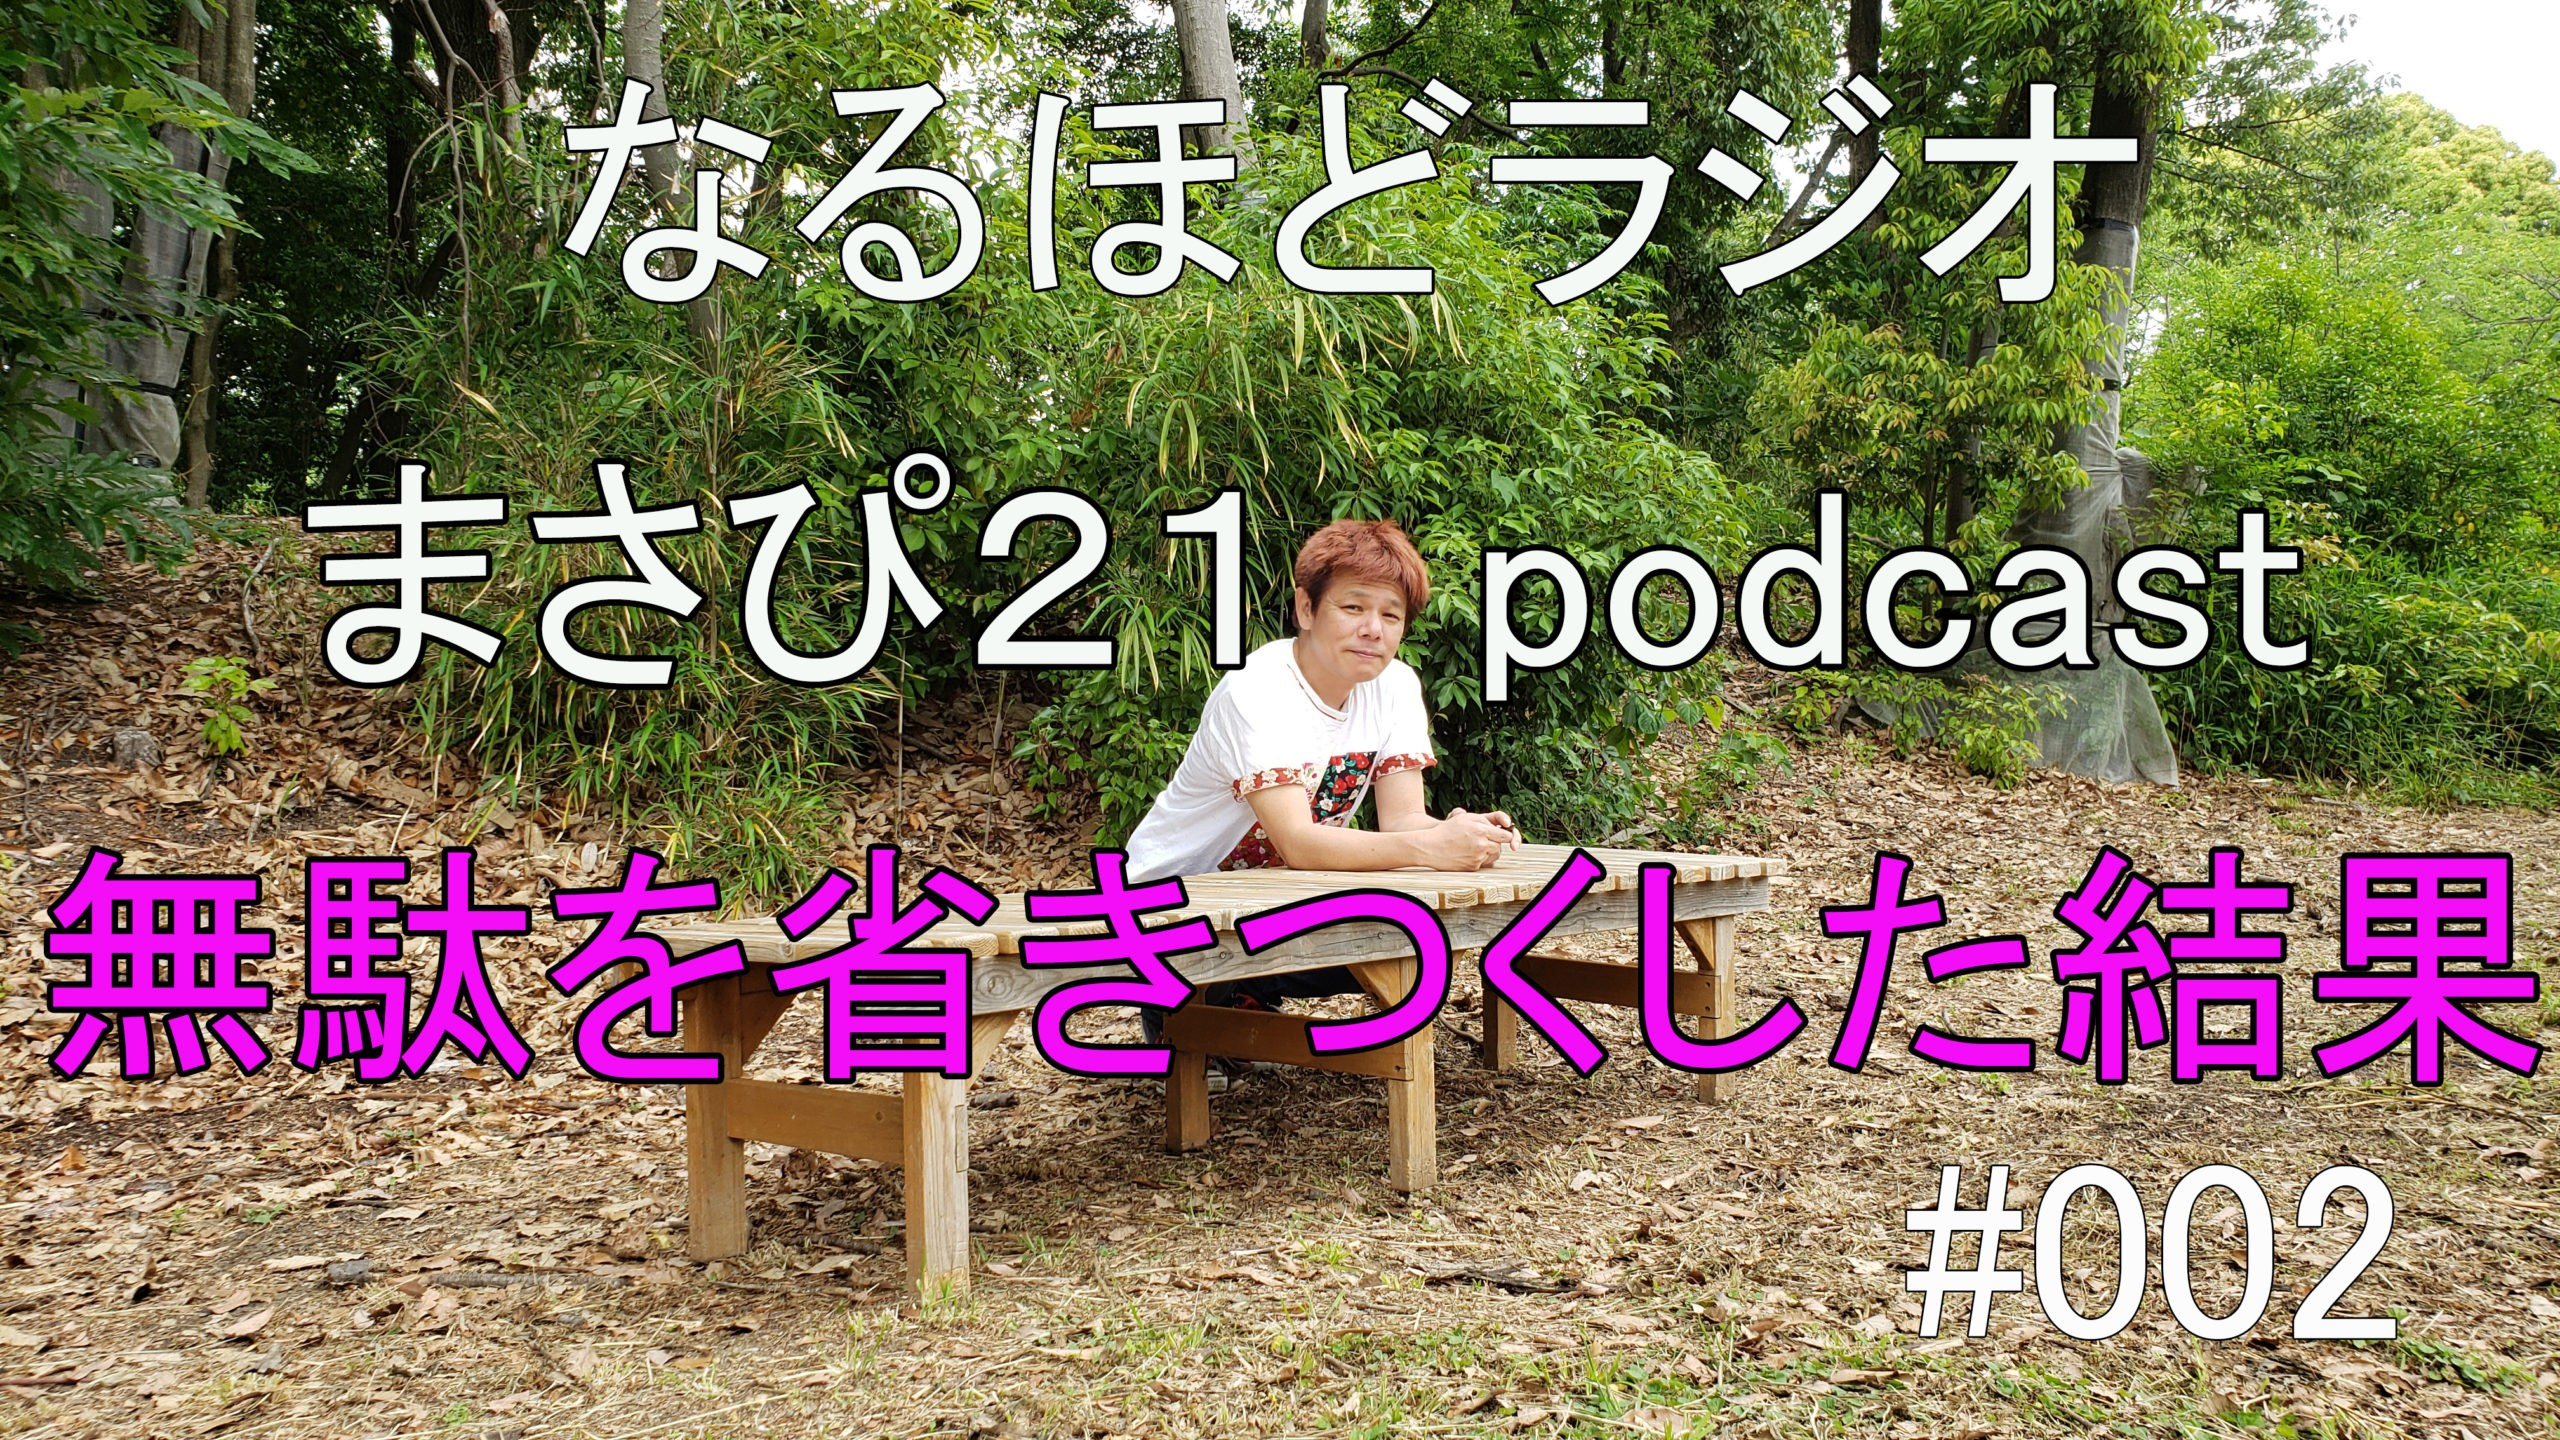 podcast masapi21 #002